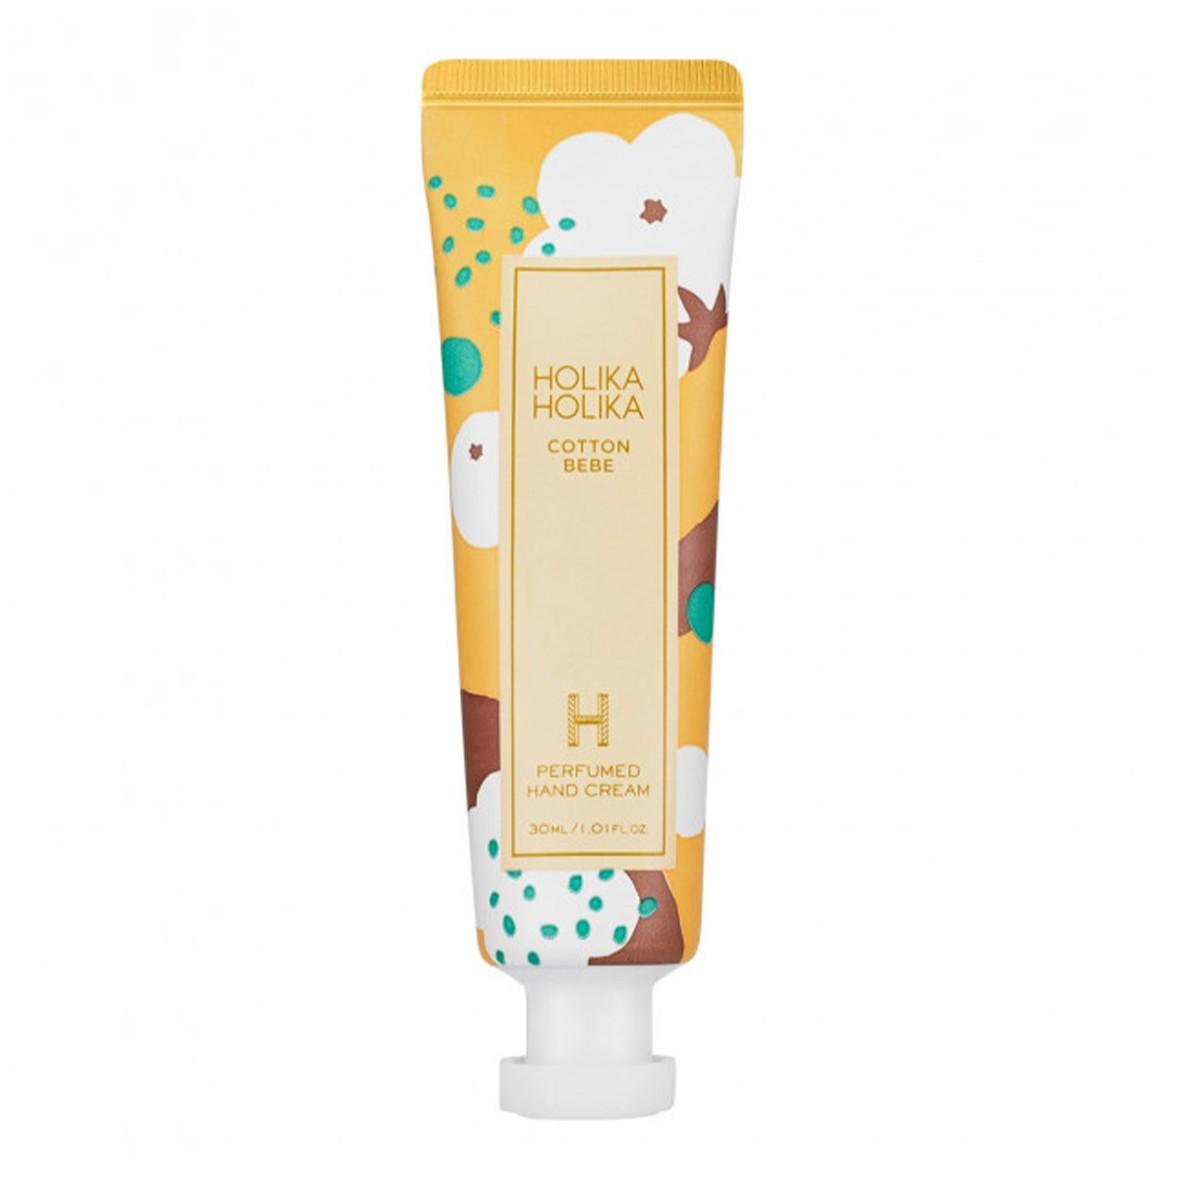 Крем для рук с хлопок Holika Holika Cotton Bebe Perfumed Hand Cream 30 мл